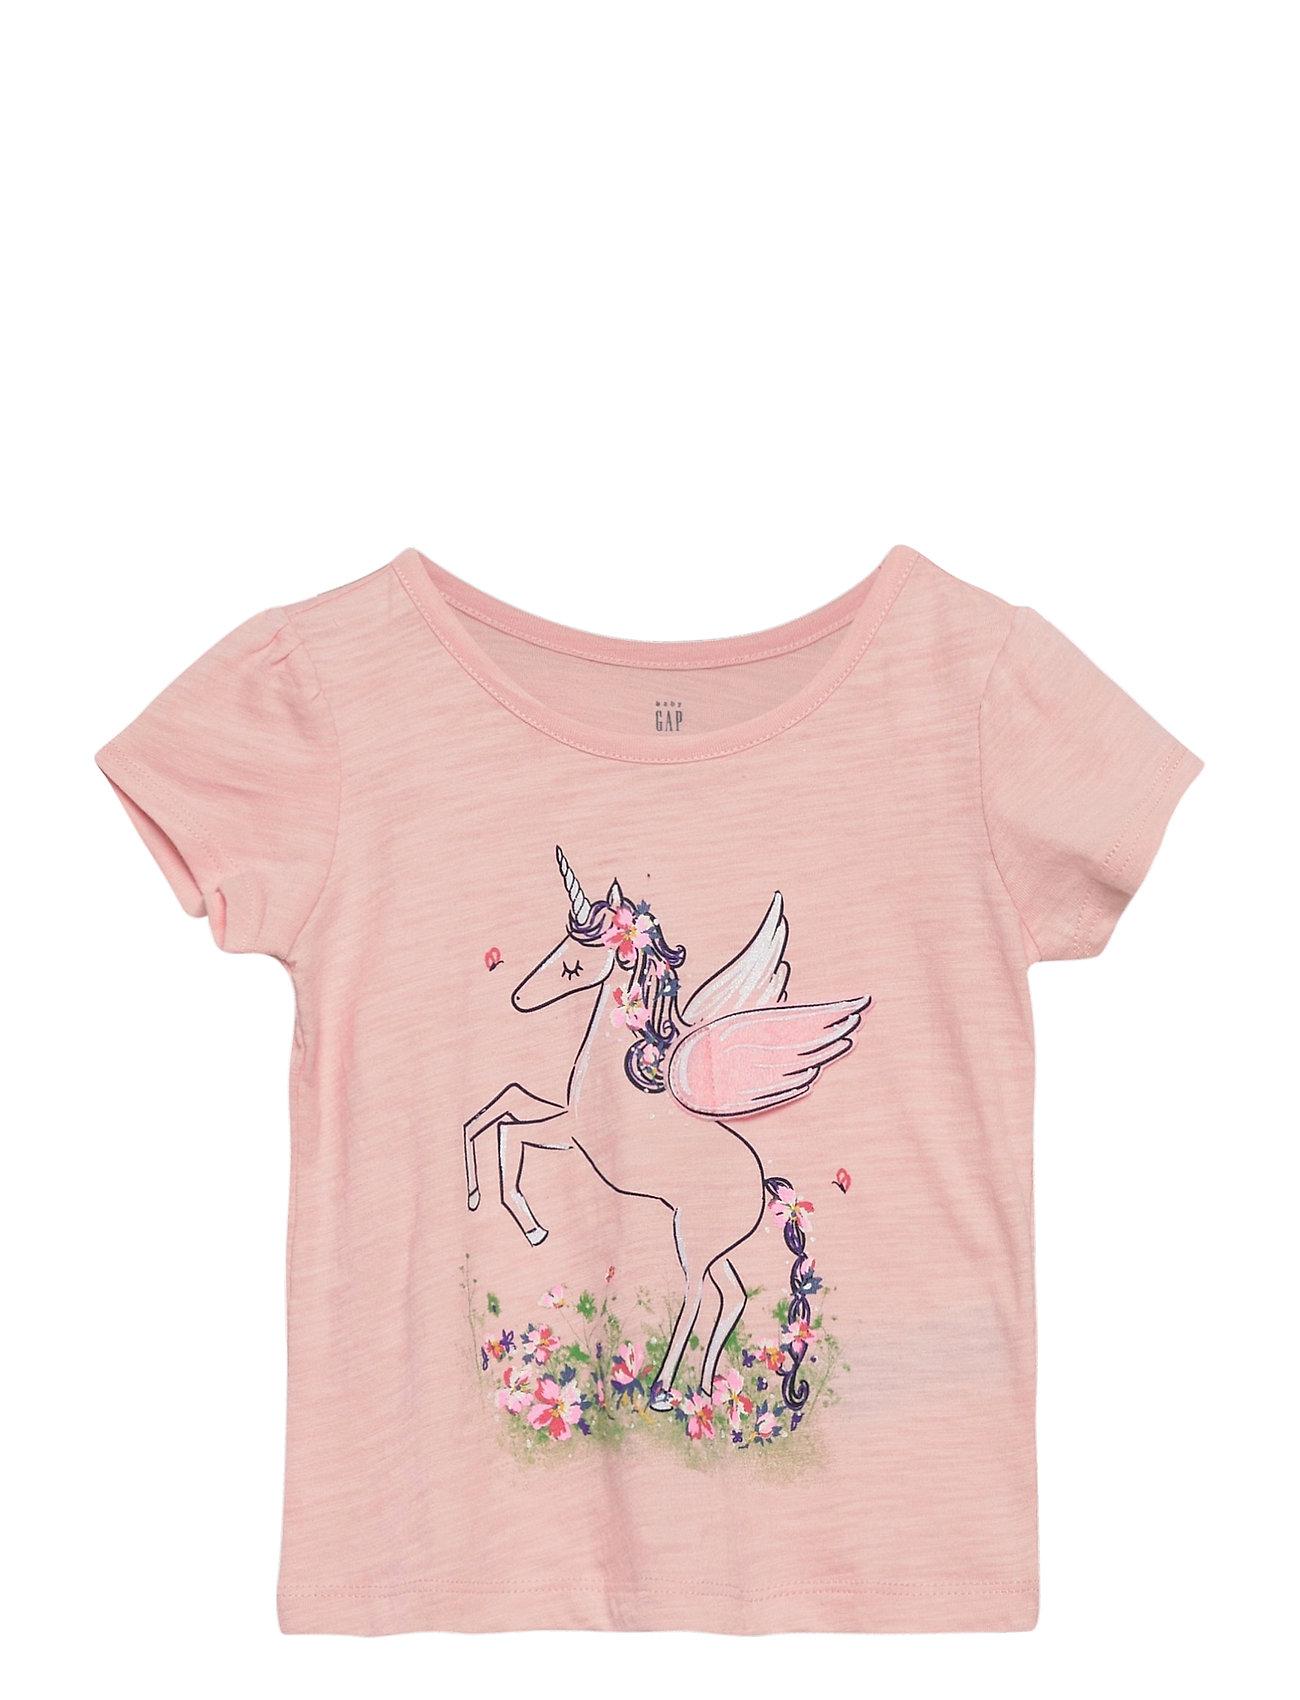 Image of Toddler Puff Sleeve Unicorn Graphic T-Shirt T-shirt Lyserød GAP (3438742475)